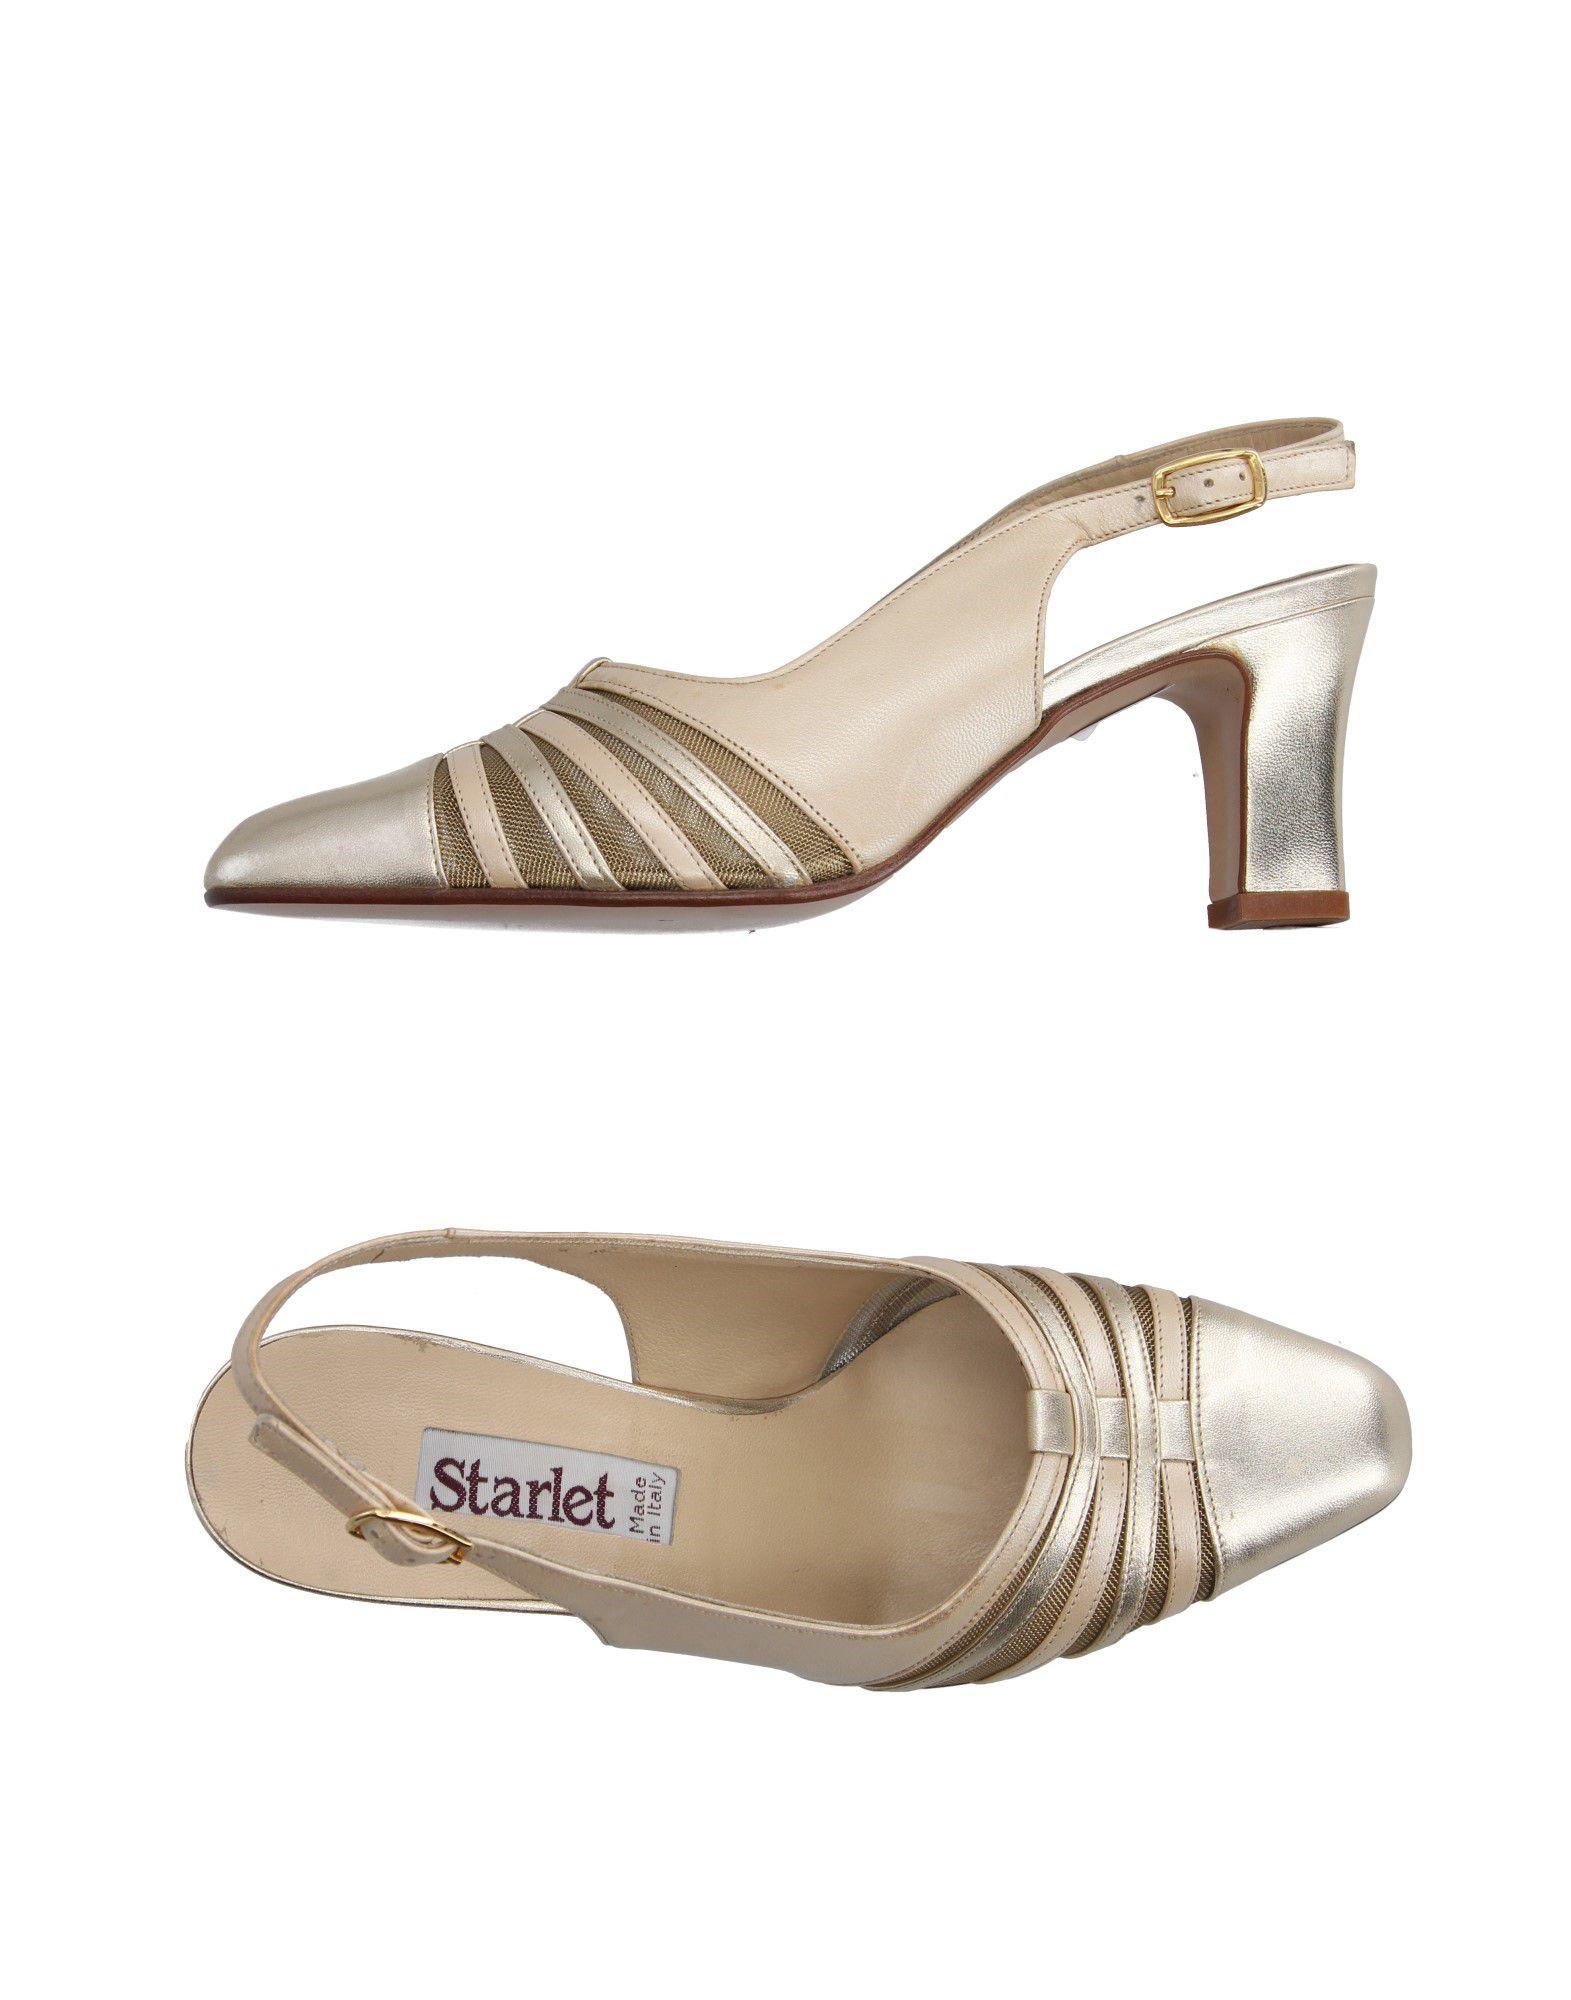 Escarpins Starlet Femme - Escarpins Starlet sur